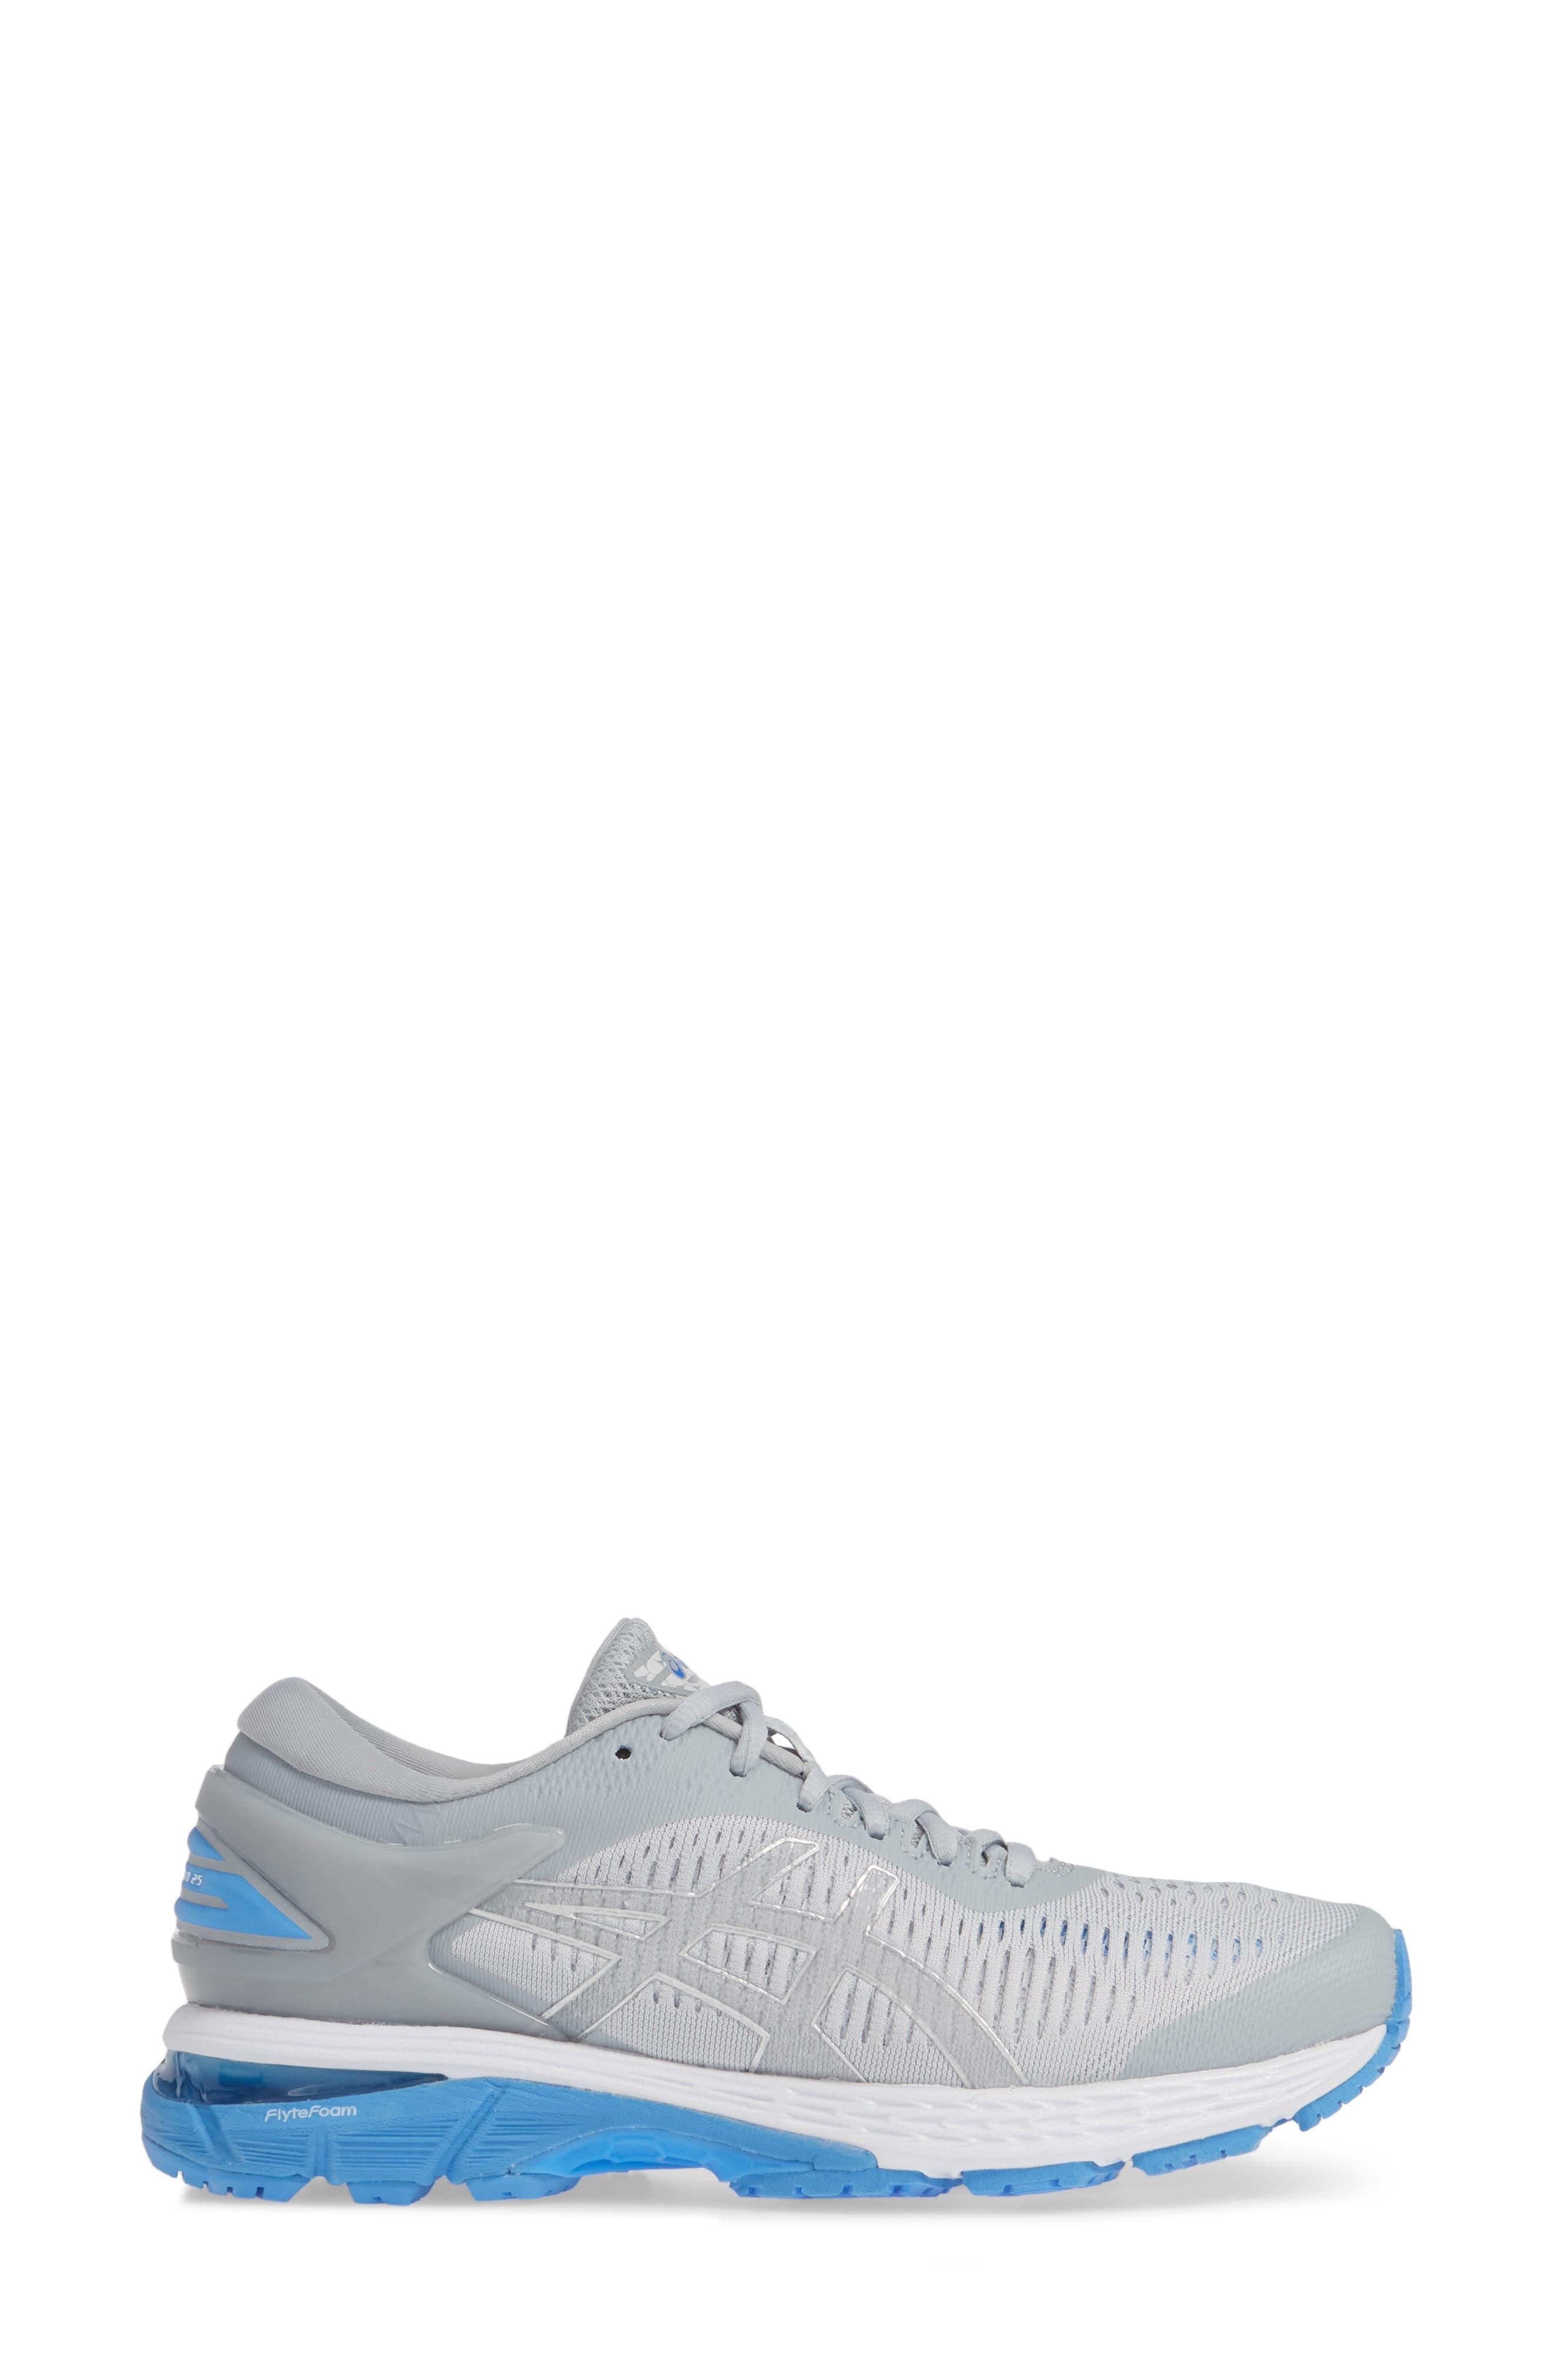 GEL-Kayano<sup>®</sup> 25 Running Shoe,                             Alternate thumbnail 3, color,                             MID GREY/ BLUE